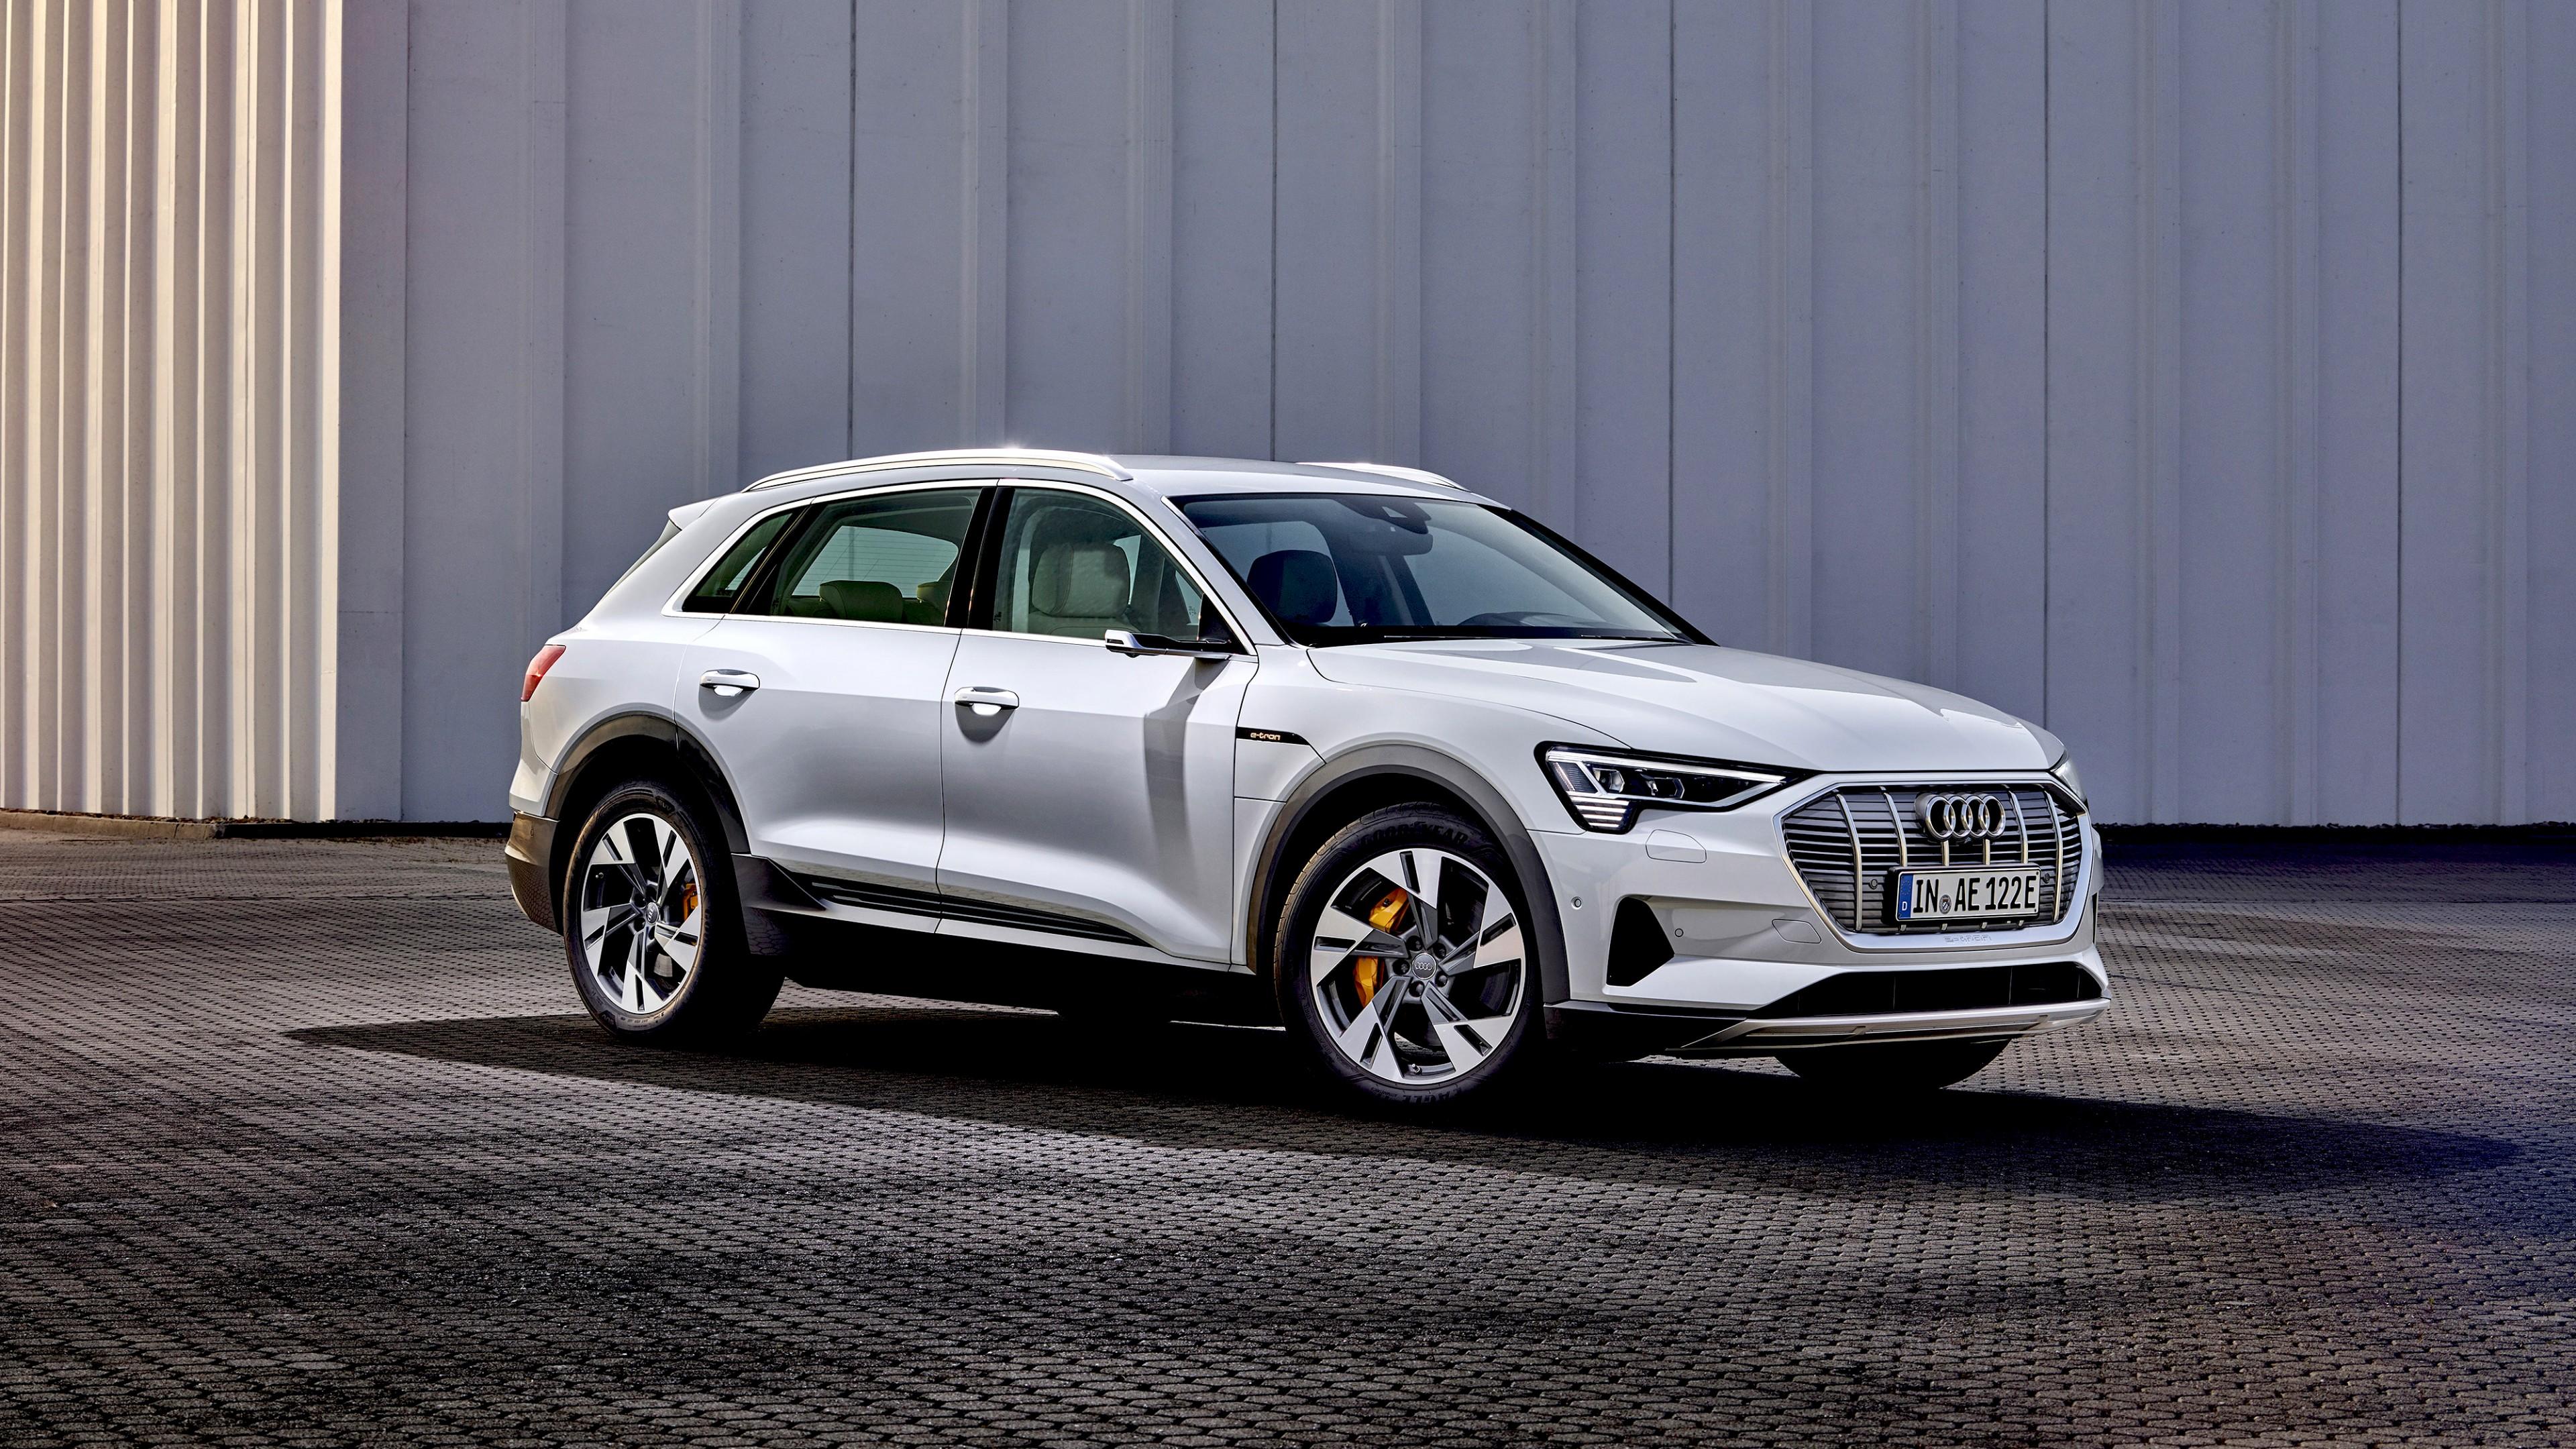 Audi E Tron 50 Quattro 2019 4k 3 Wallpaper Hd Car Wallpapers Id 12948